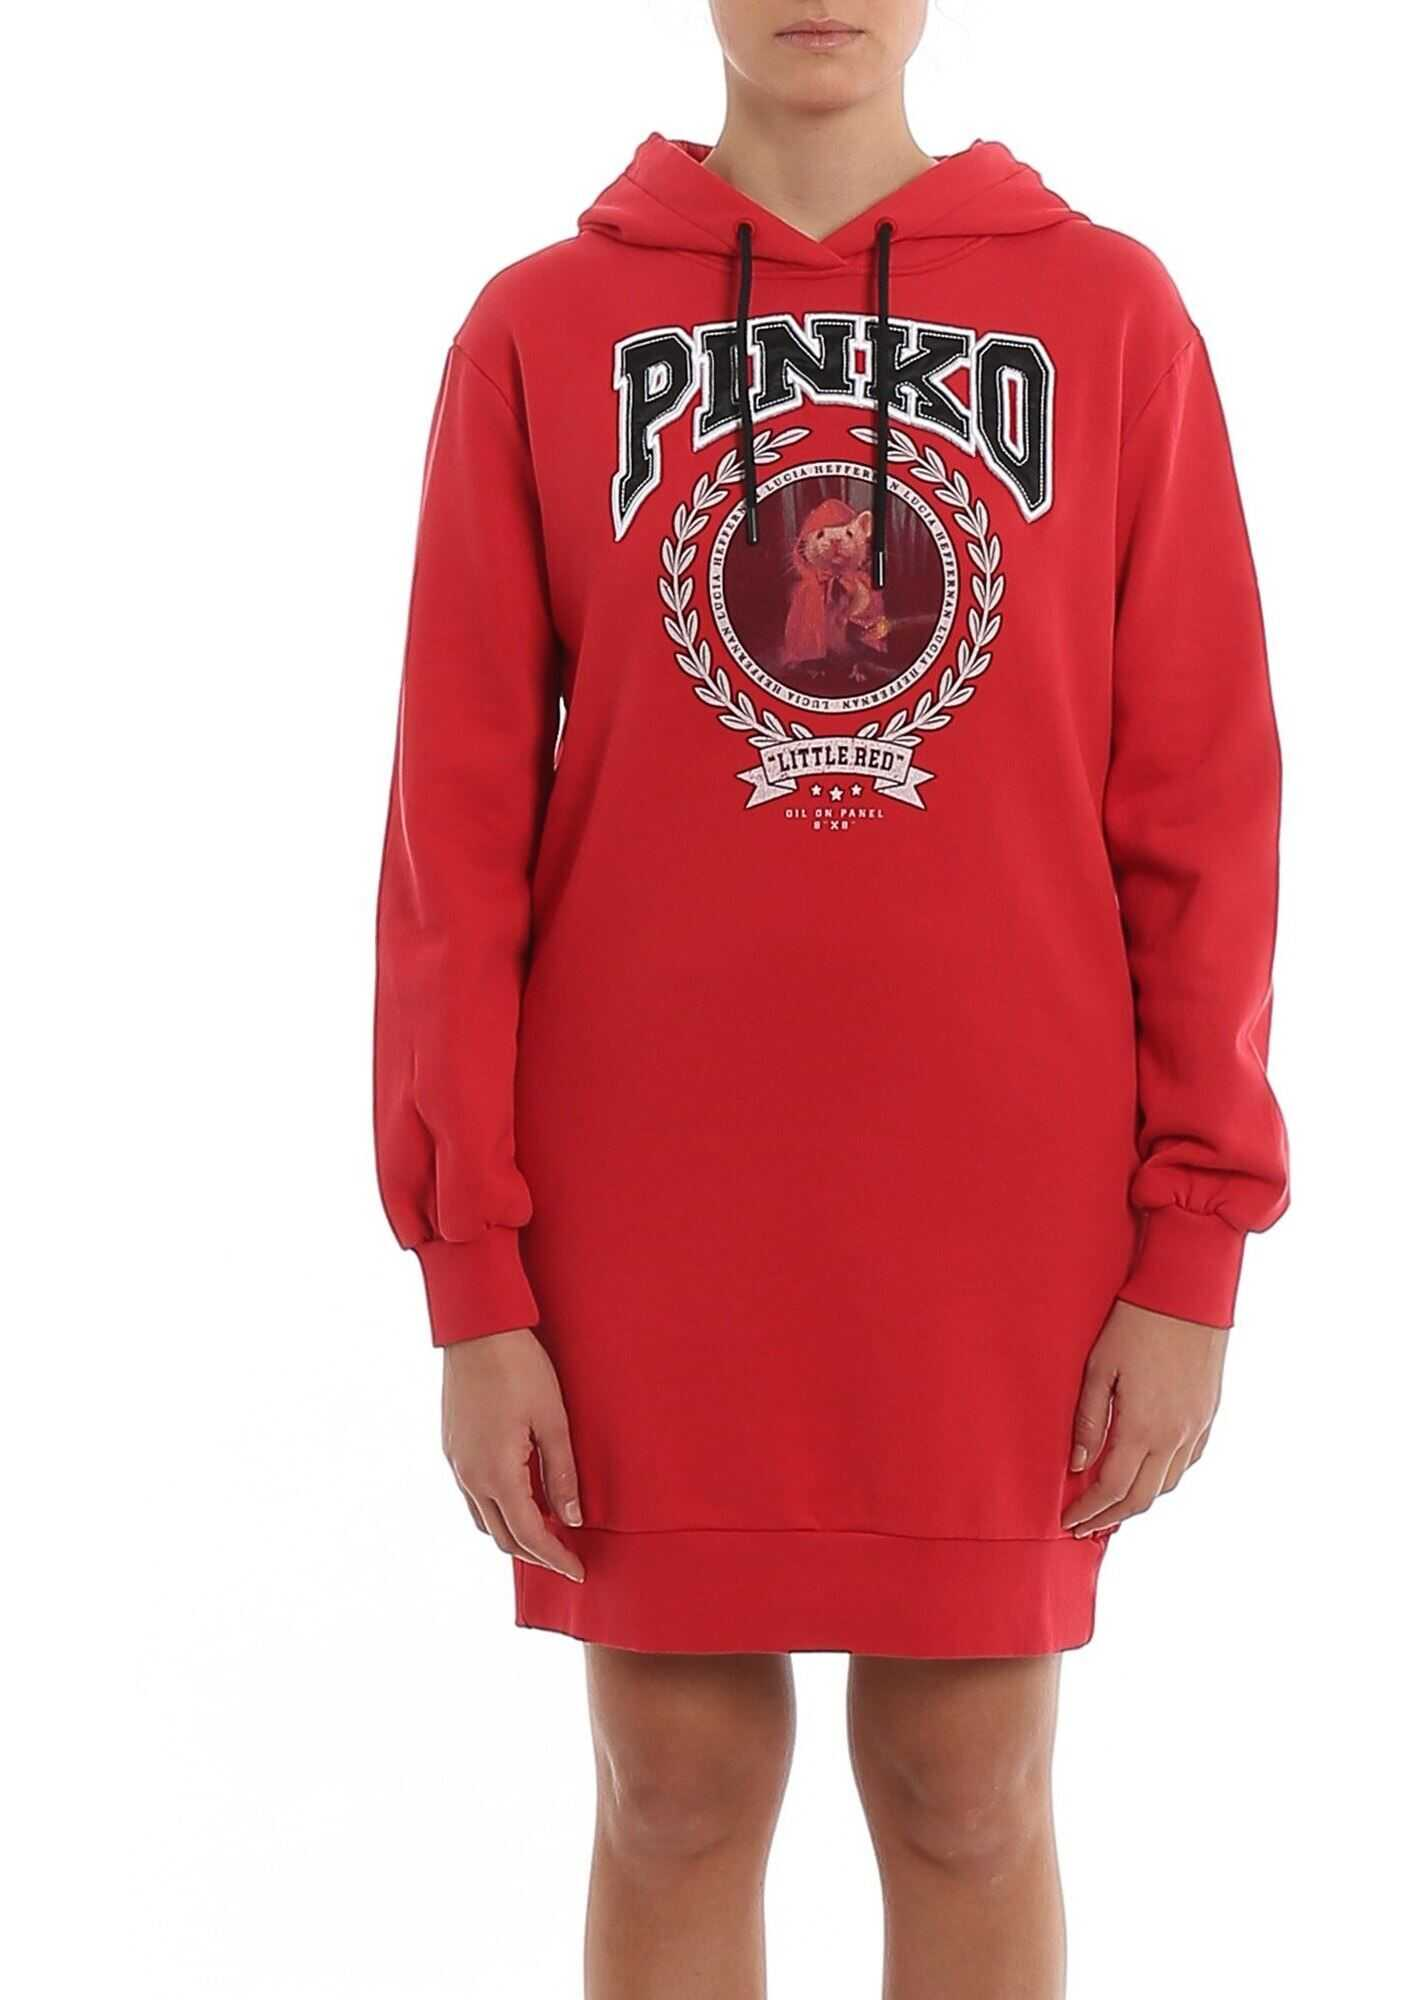 Pinko Obsidian Hoodie Style Dress Red